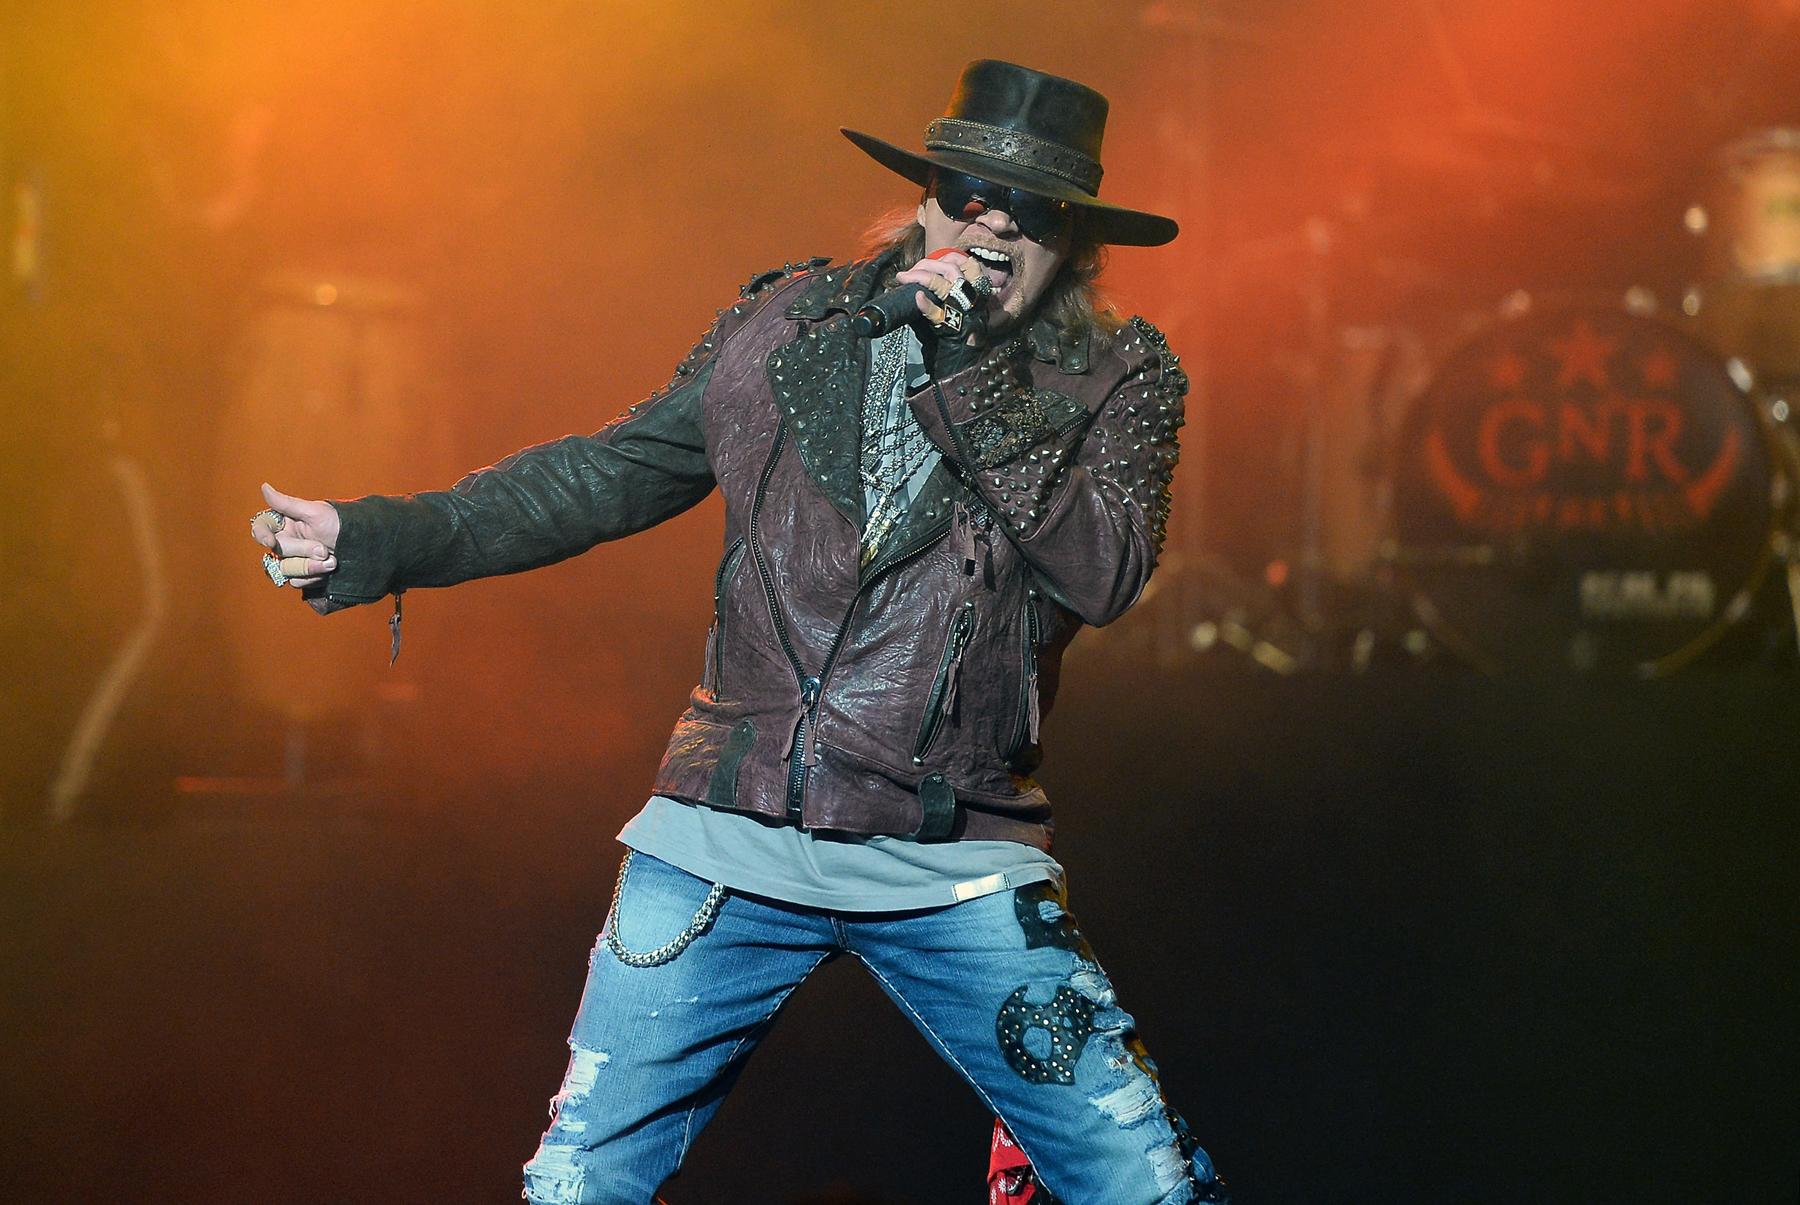 Axl Rose Responds to List Calling Him 'World's Greatest Singer'